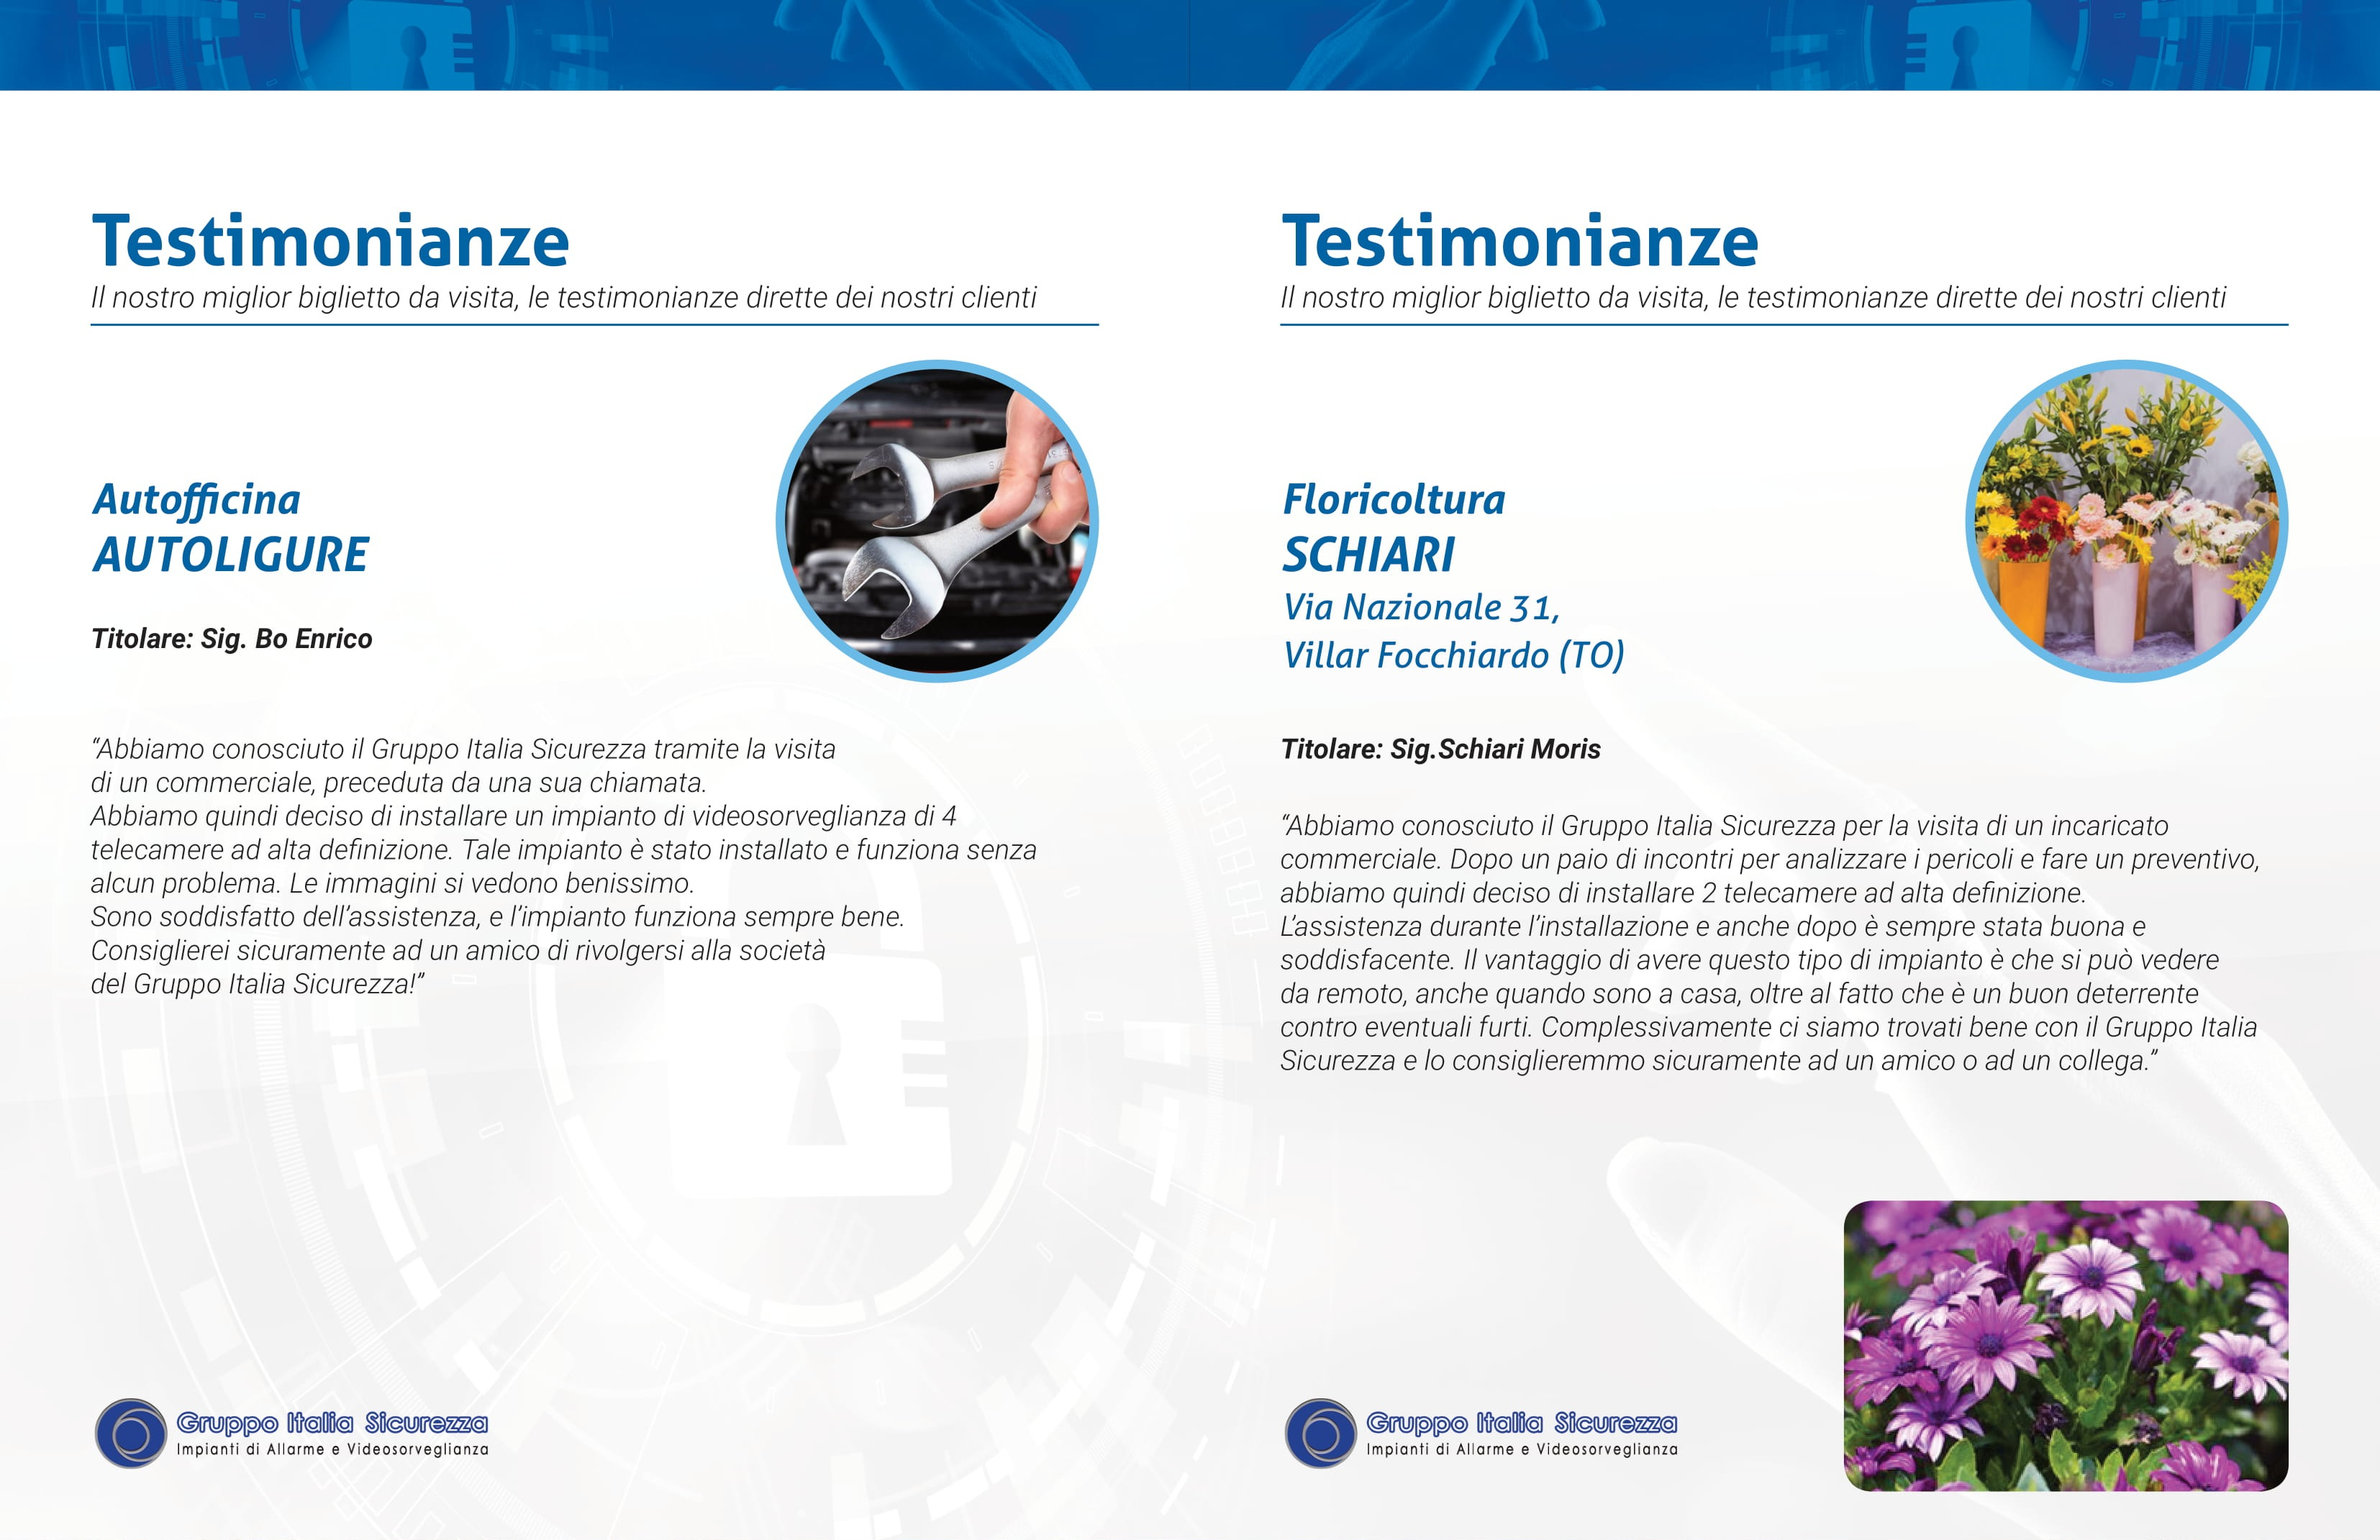 GIS-Catalogo-A4-LAST_020-020-1